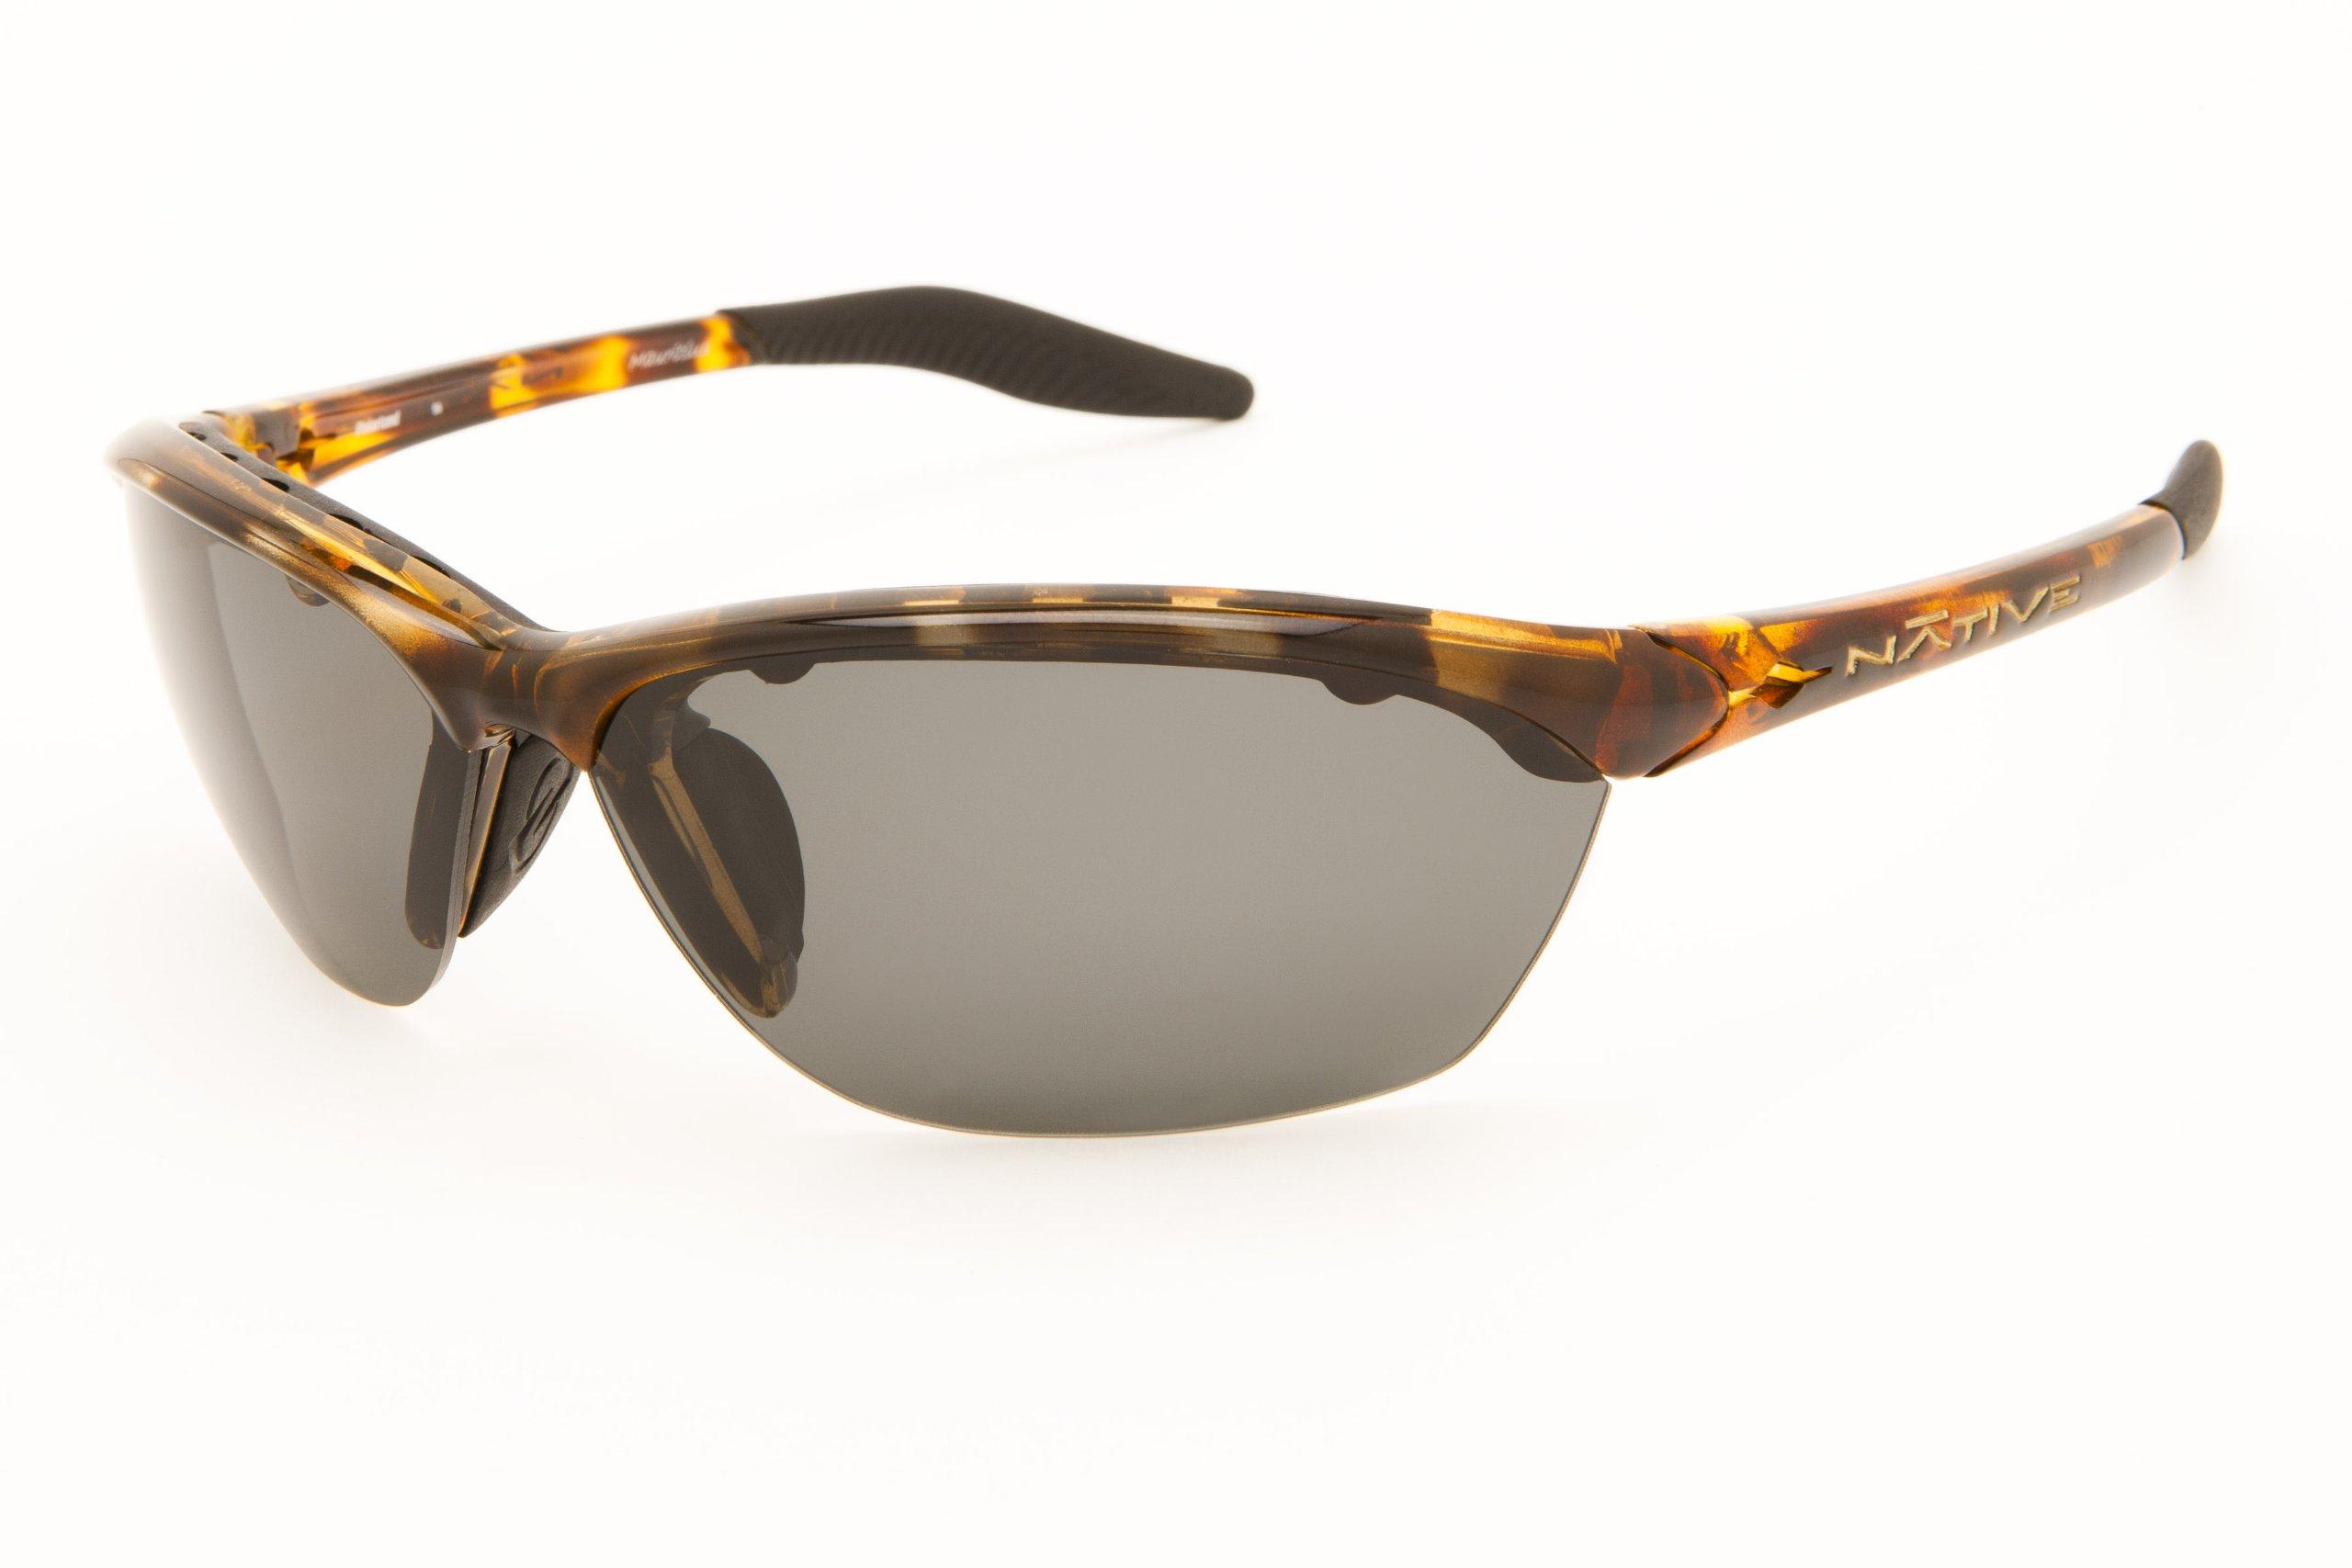 Native Eyewear Hardtop Sunglasses, Tobacco with Gray Lens